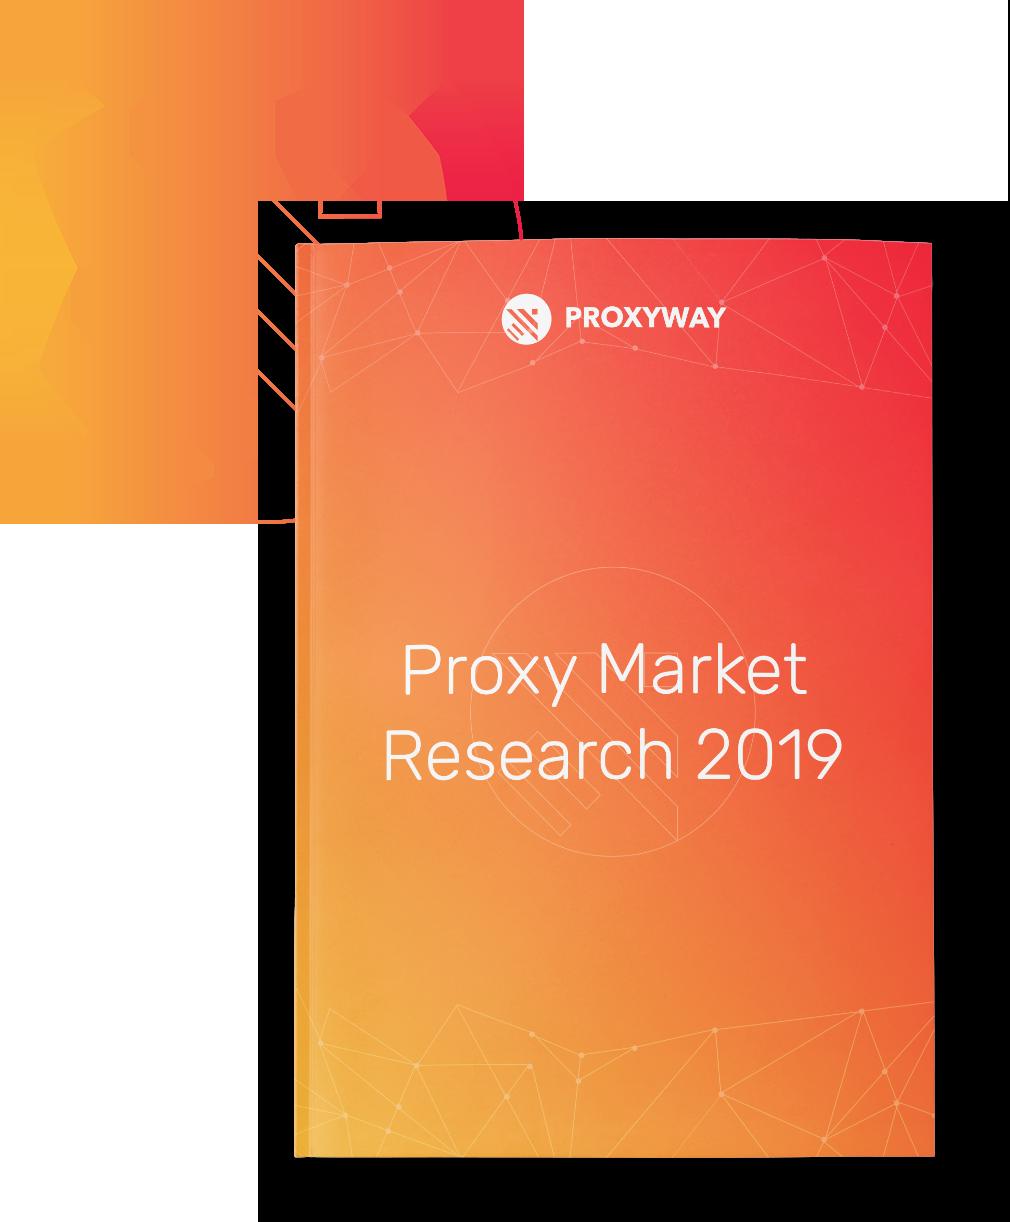 Proxy Market Research 2019 | Proxy Reviews & Comparisons